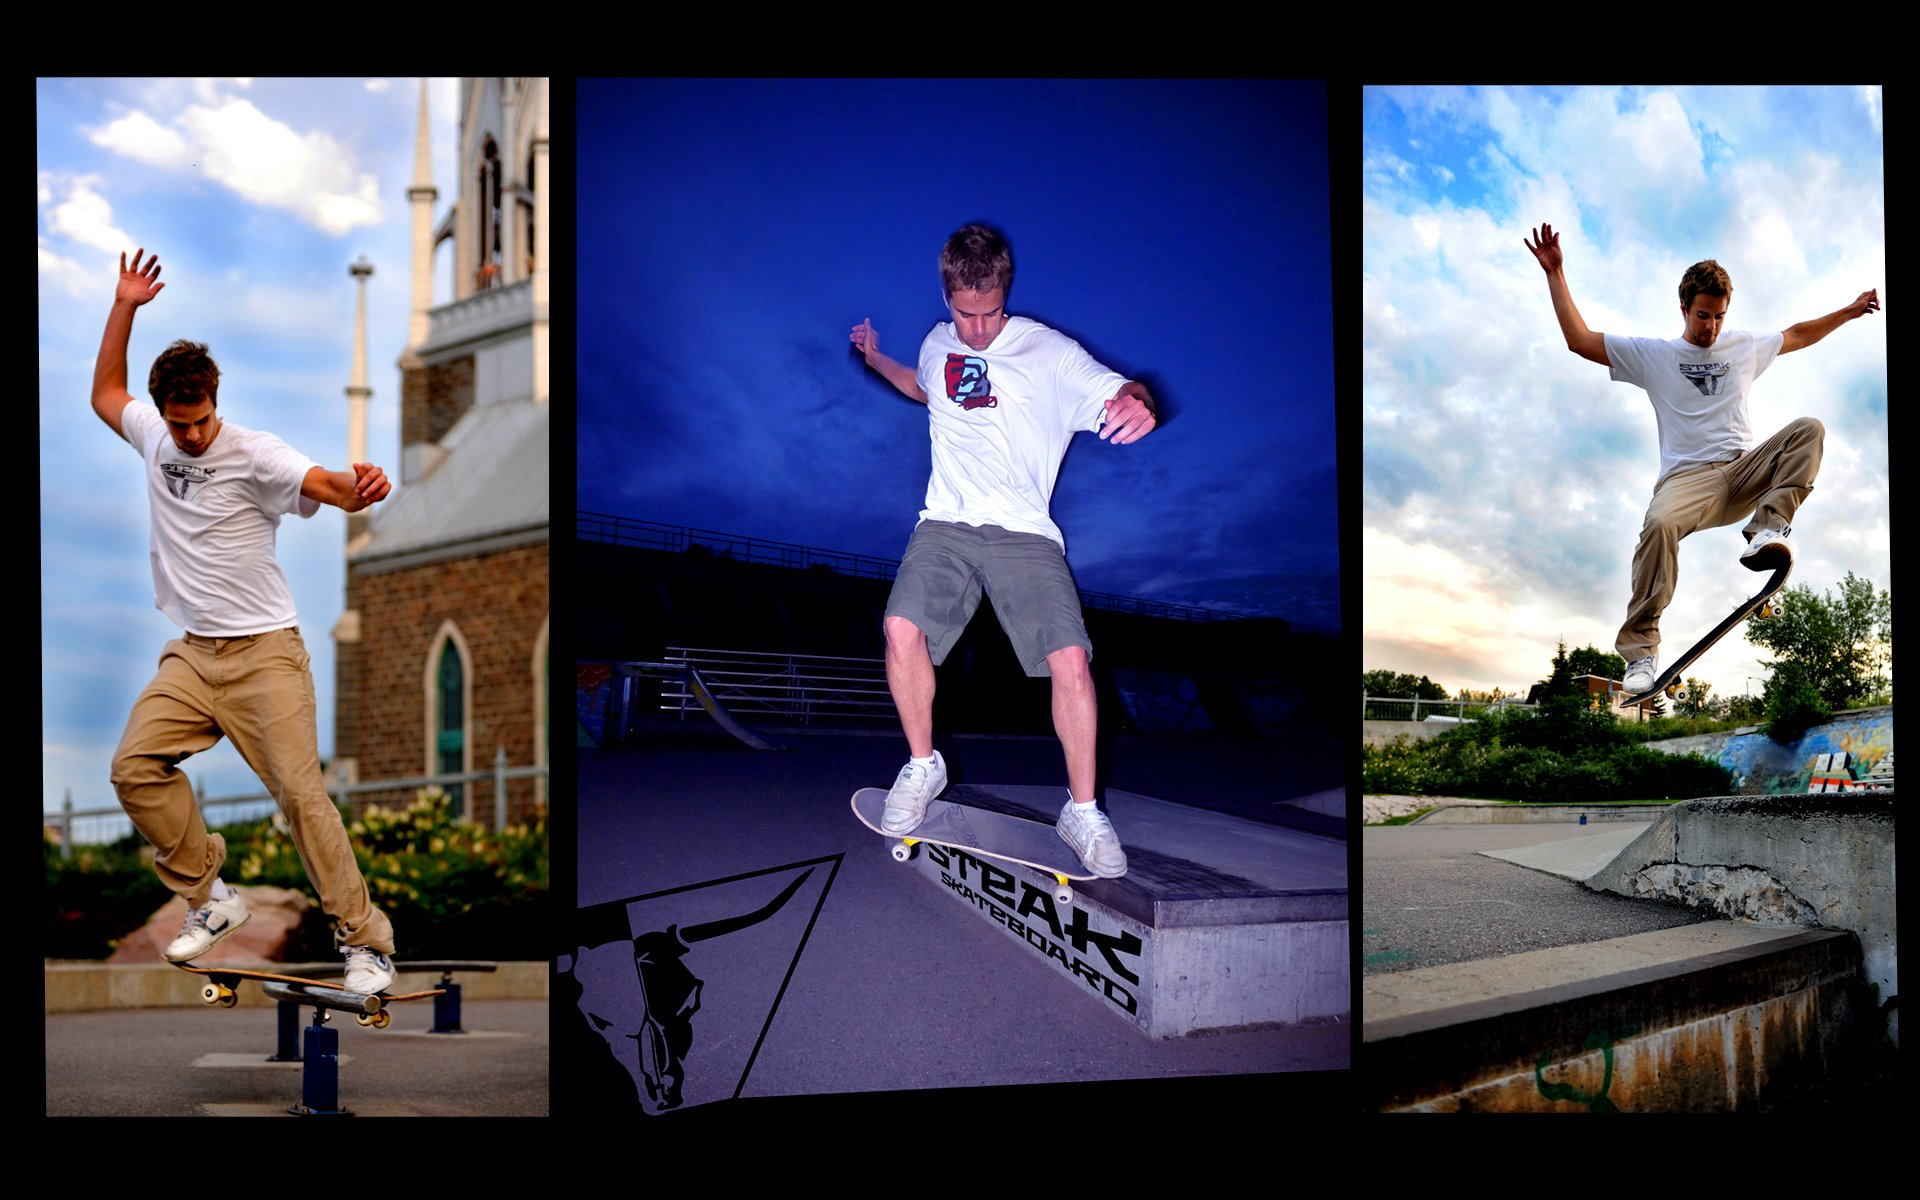 Deporte - Skate  Skateboard Fondo de Pantalla